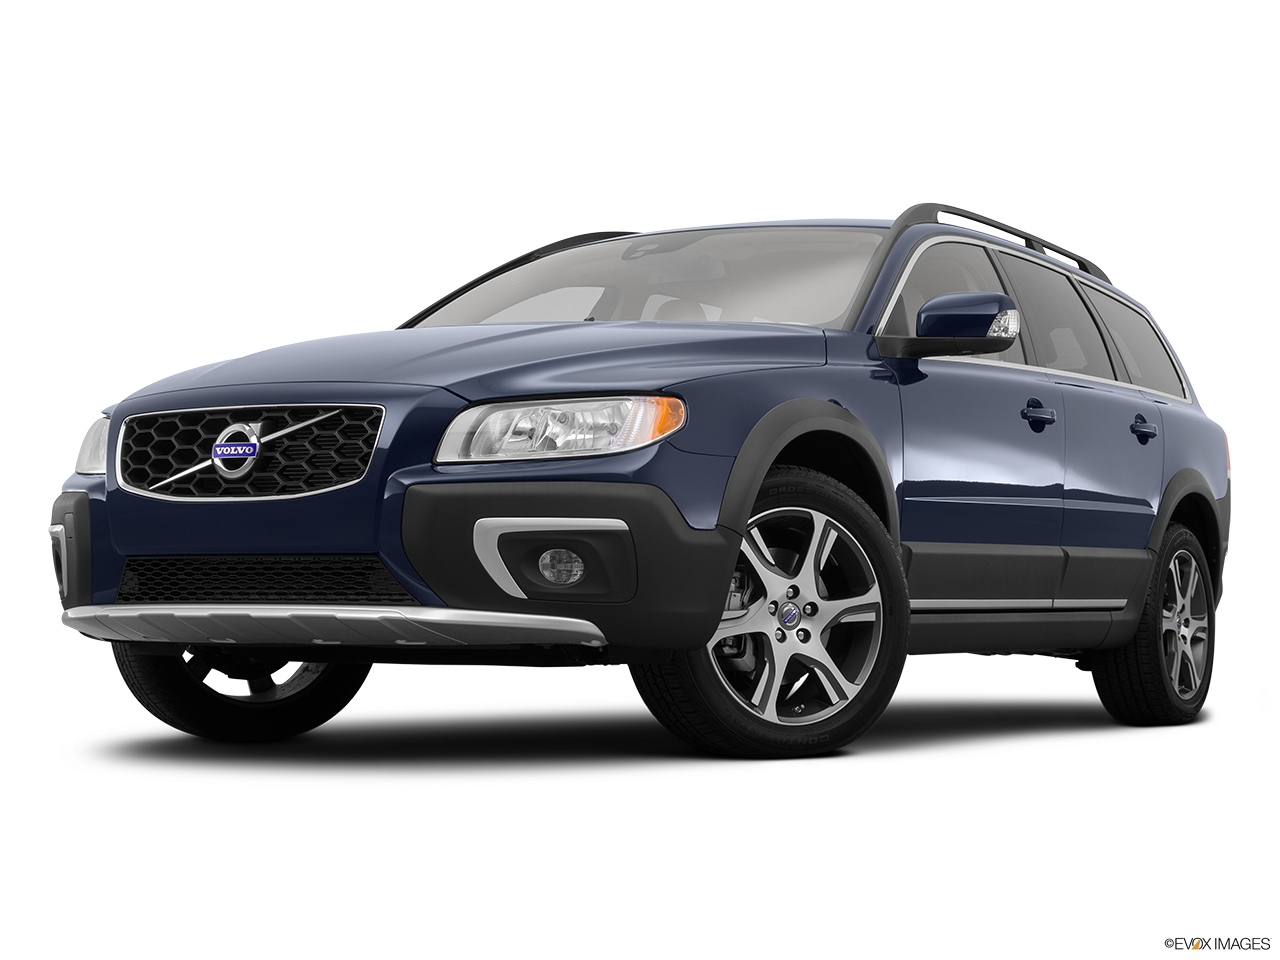 Floor mats volvo xc70 - 2015 Volvo Xc70 Awd 4 Door T6 Wagon Front Angle View Low Wide Perspective